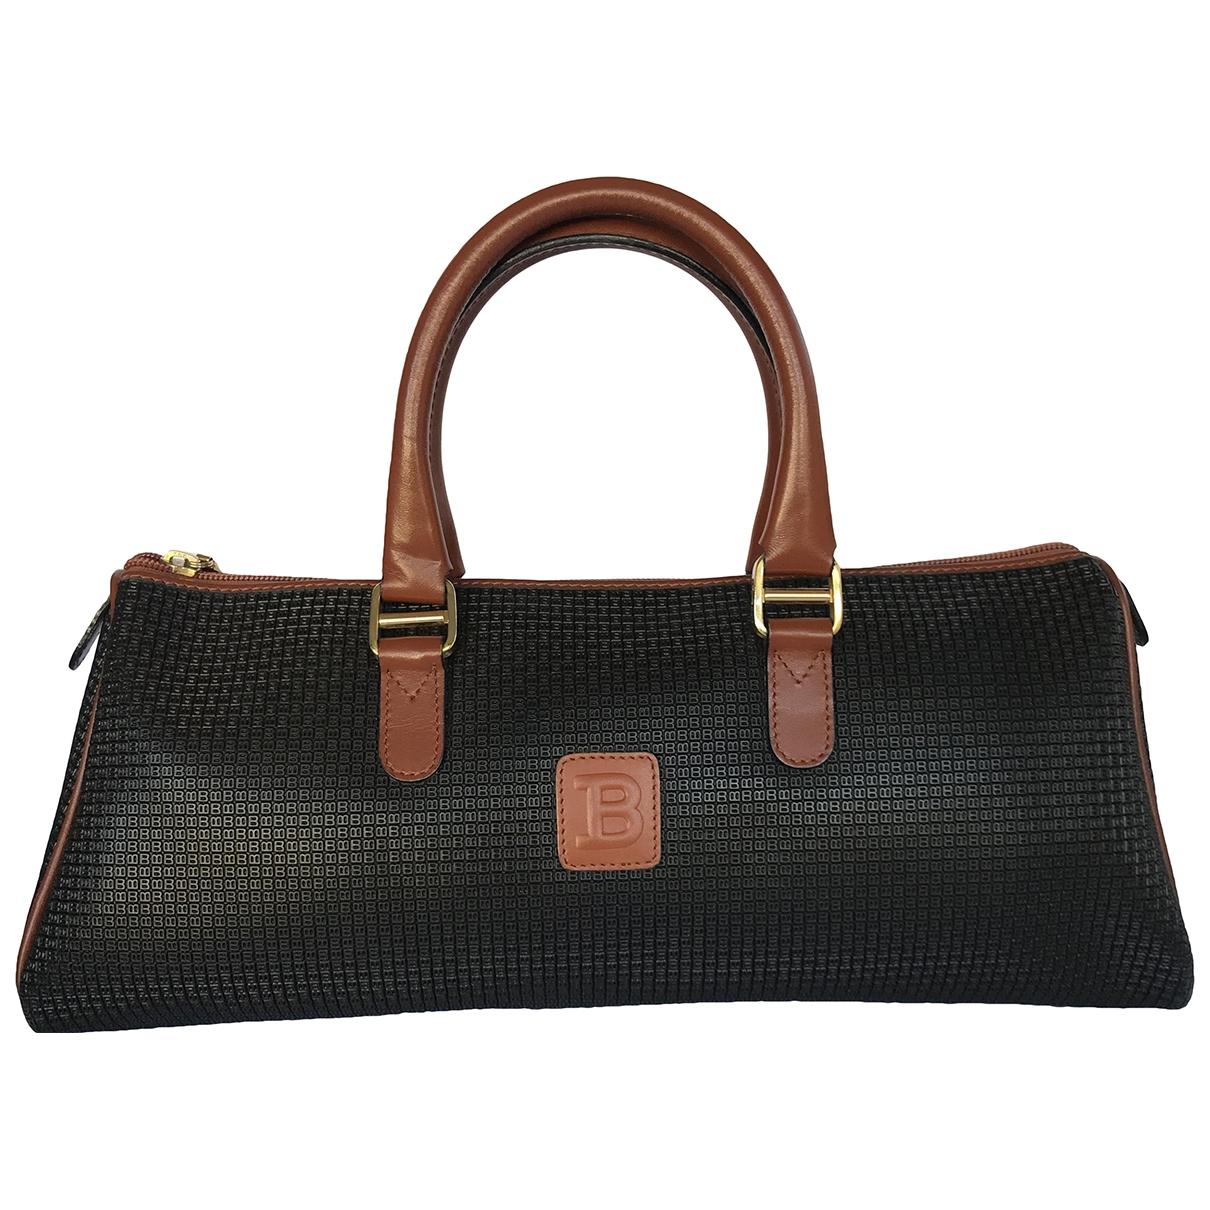 Bally \N Handtasche in  Grau Leder